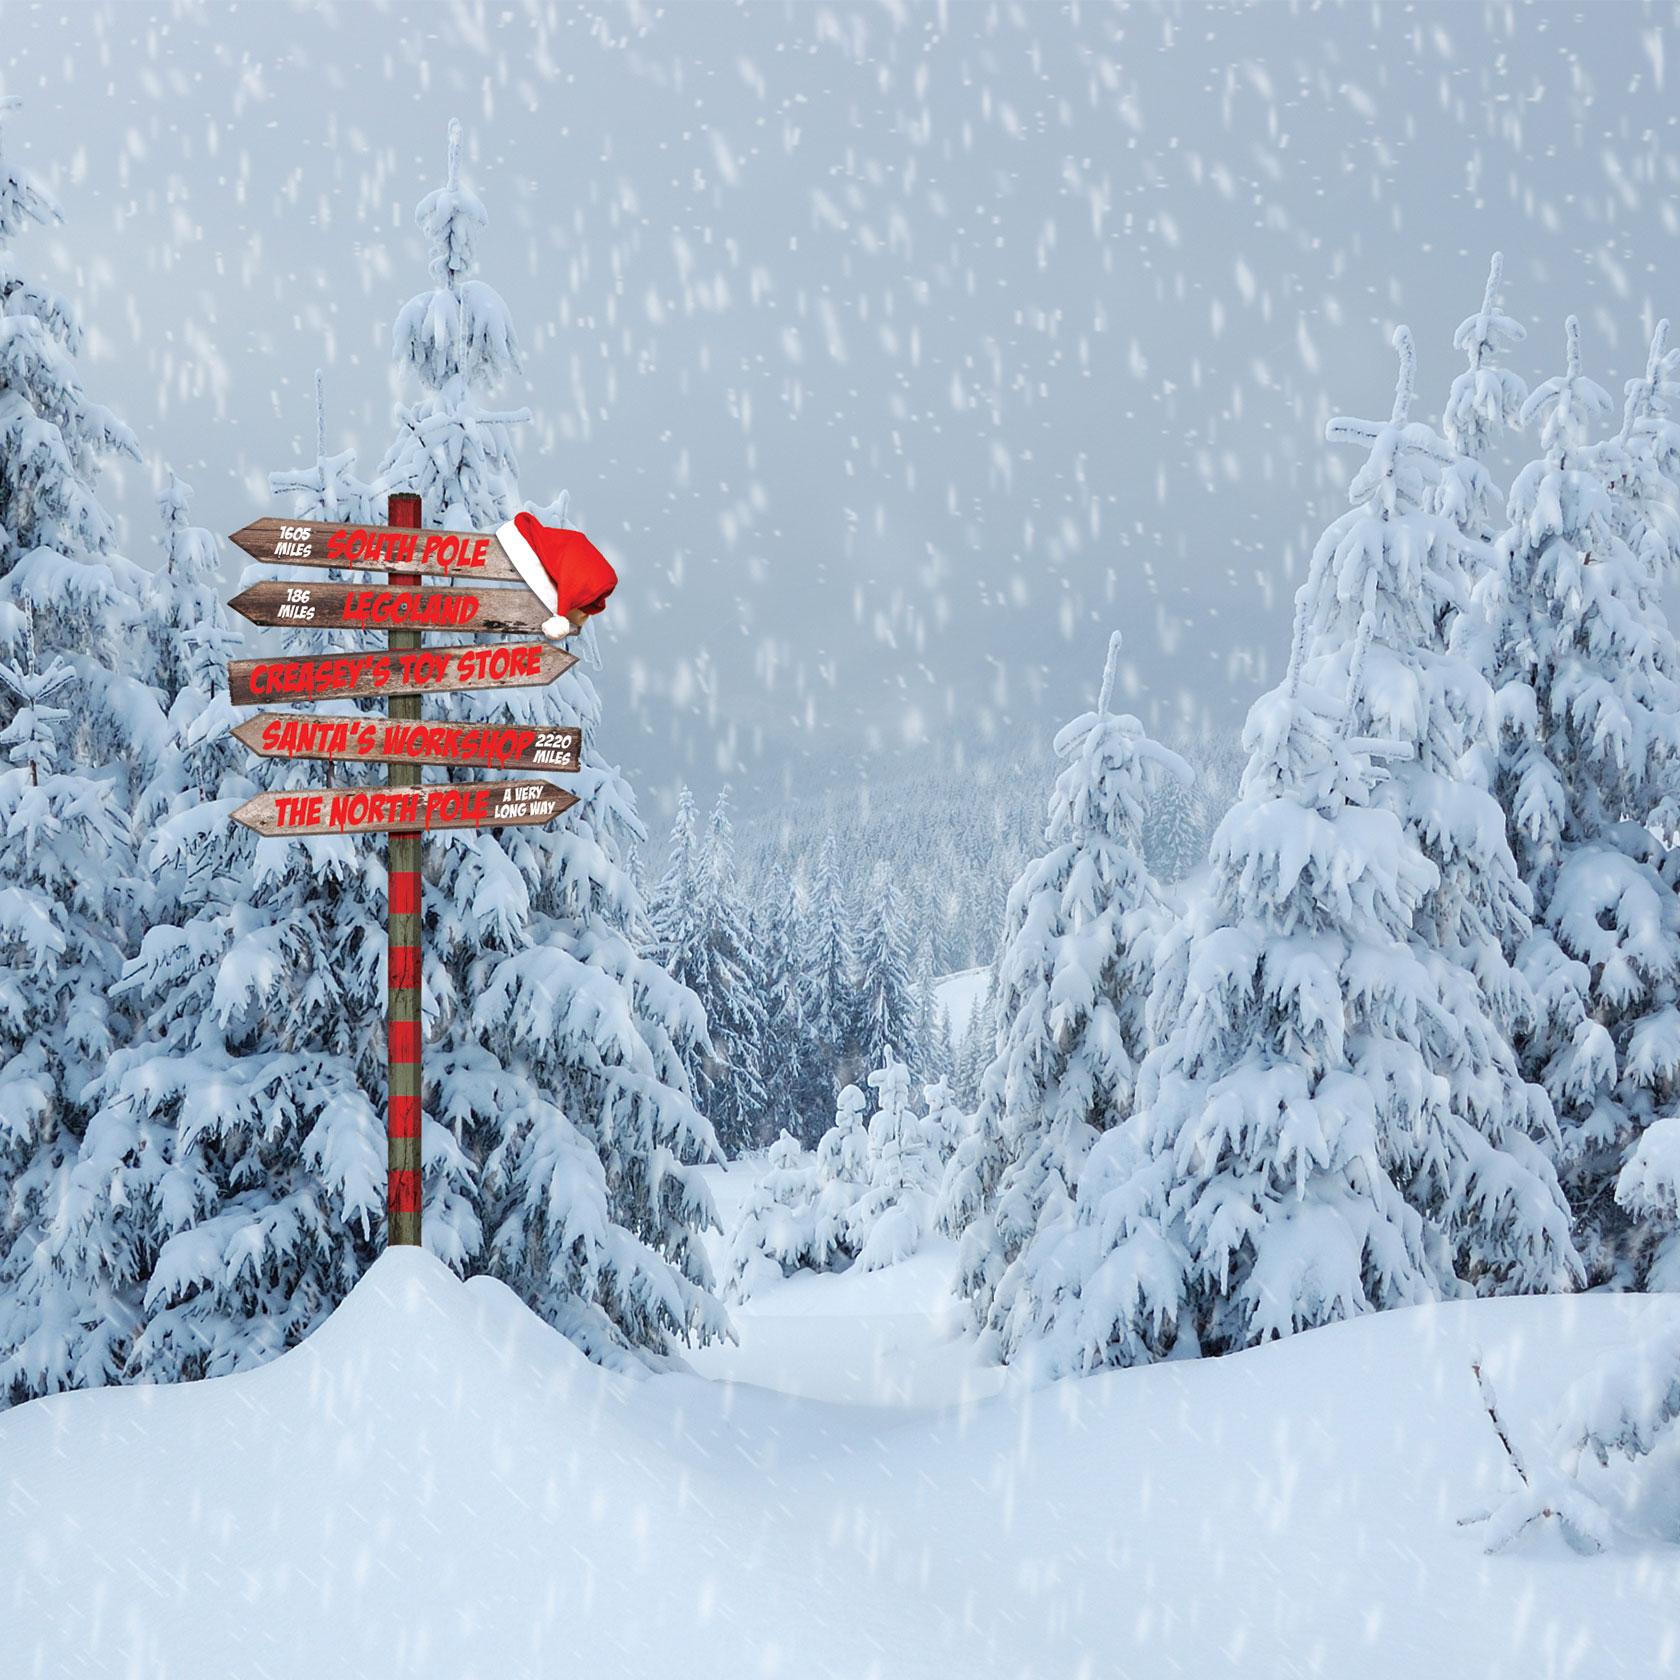 Santa's Grotto image 1